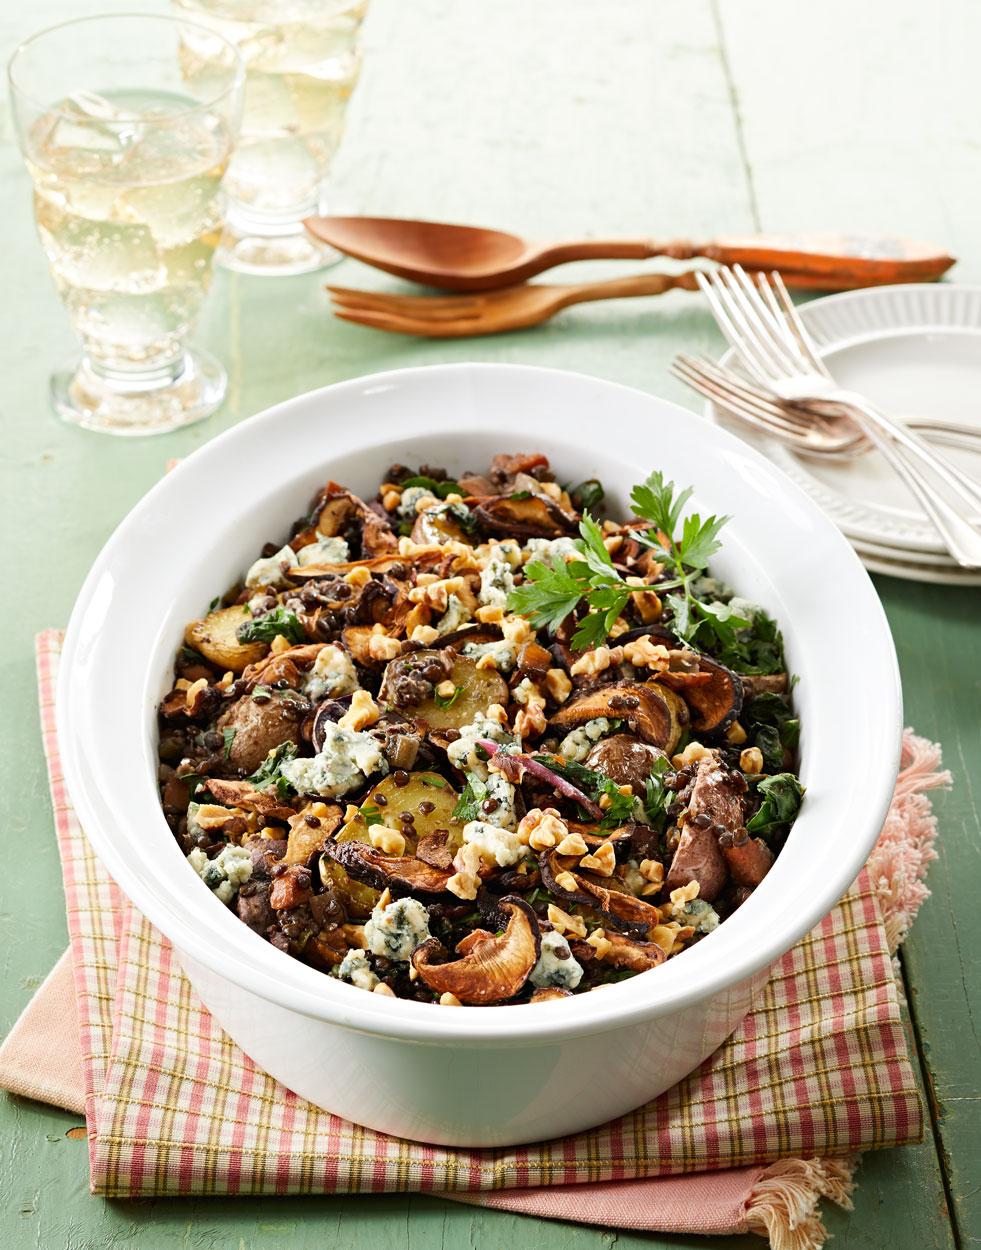 Warm Beluga Lentil Chard Salad Recipe